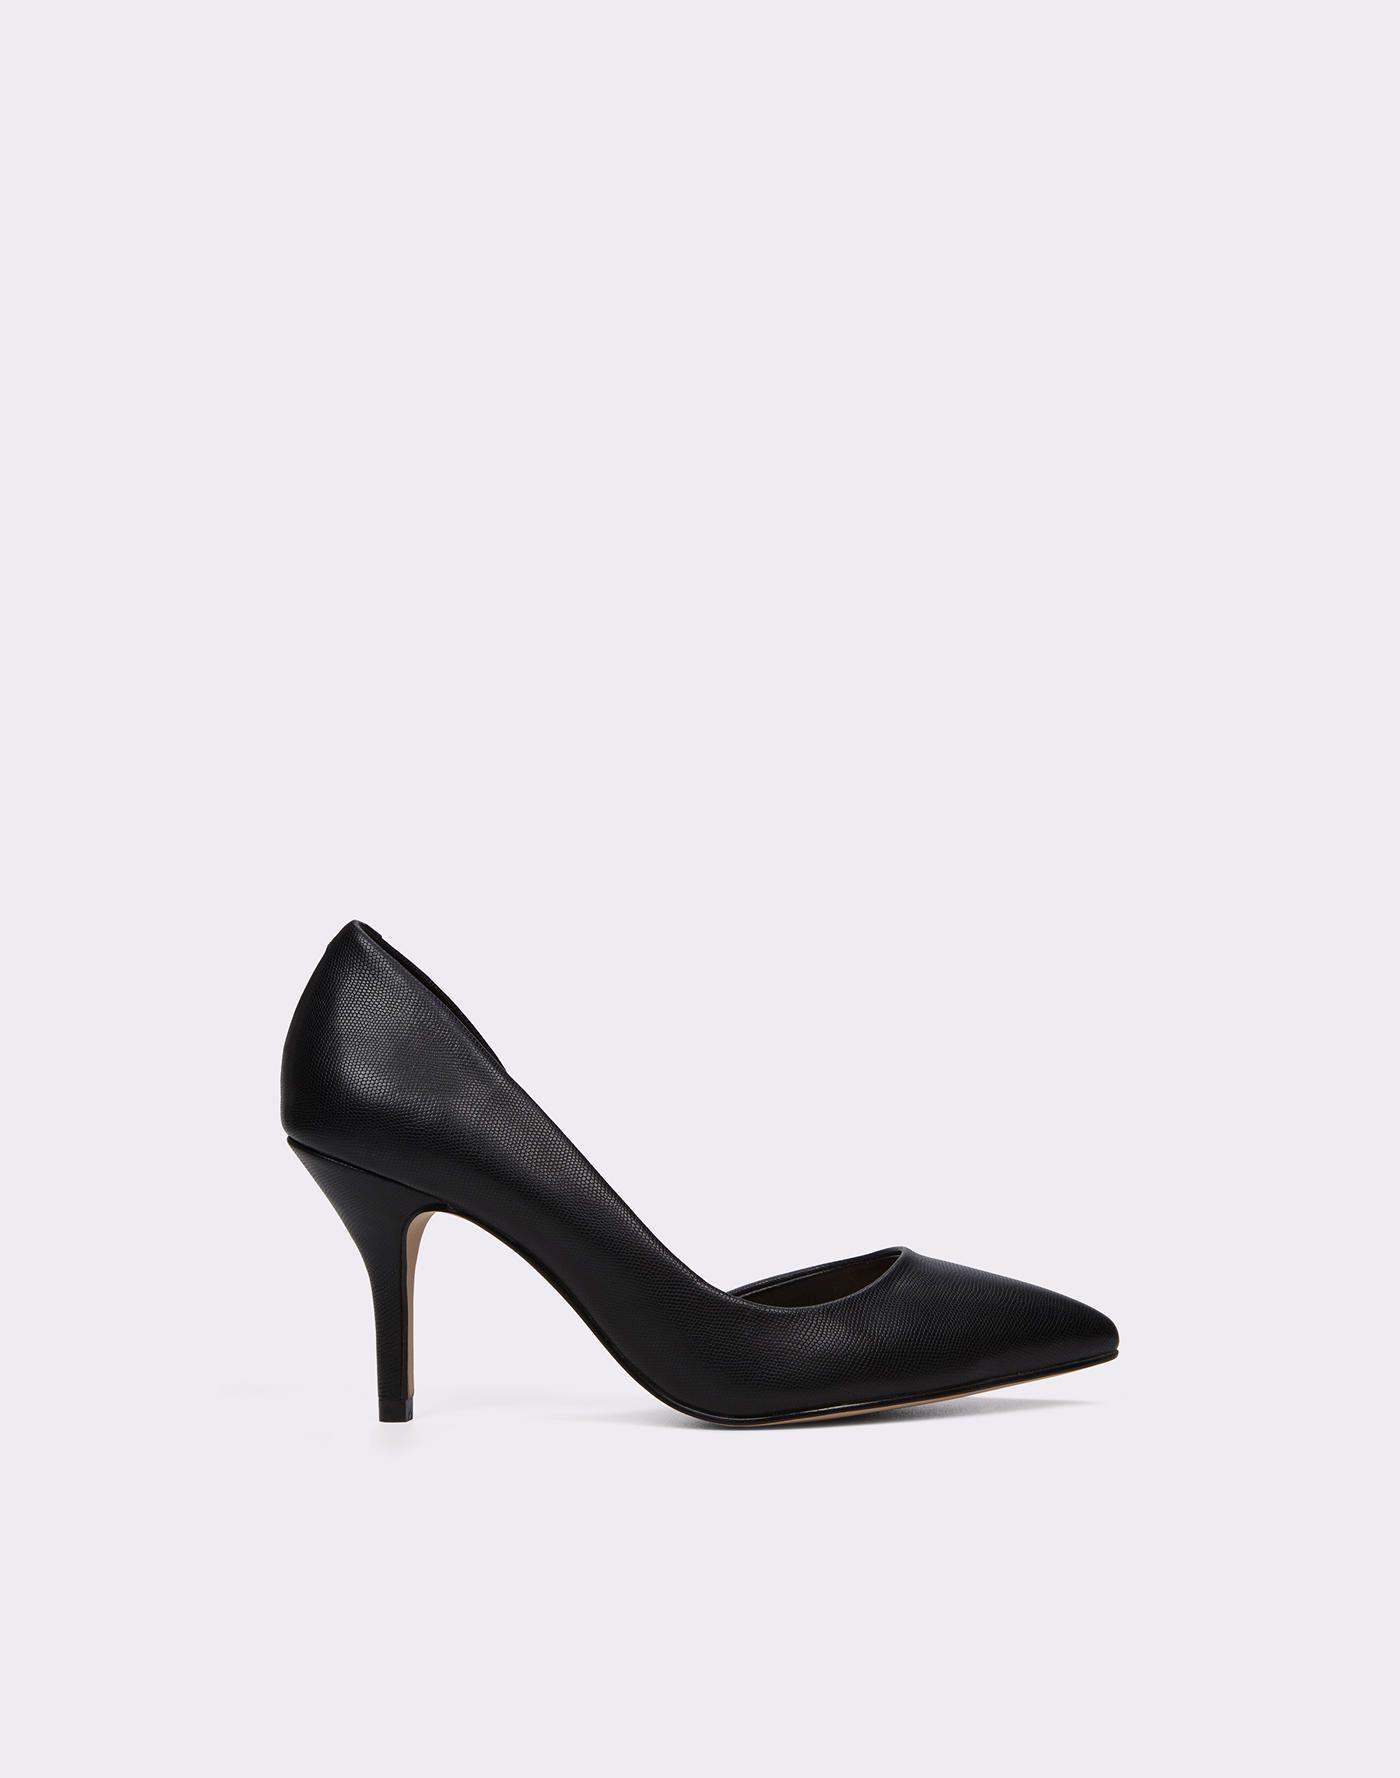 5c684873e0a Ecidia | Work Shoes | Heels, Shoes, Crazy shoes